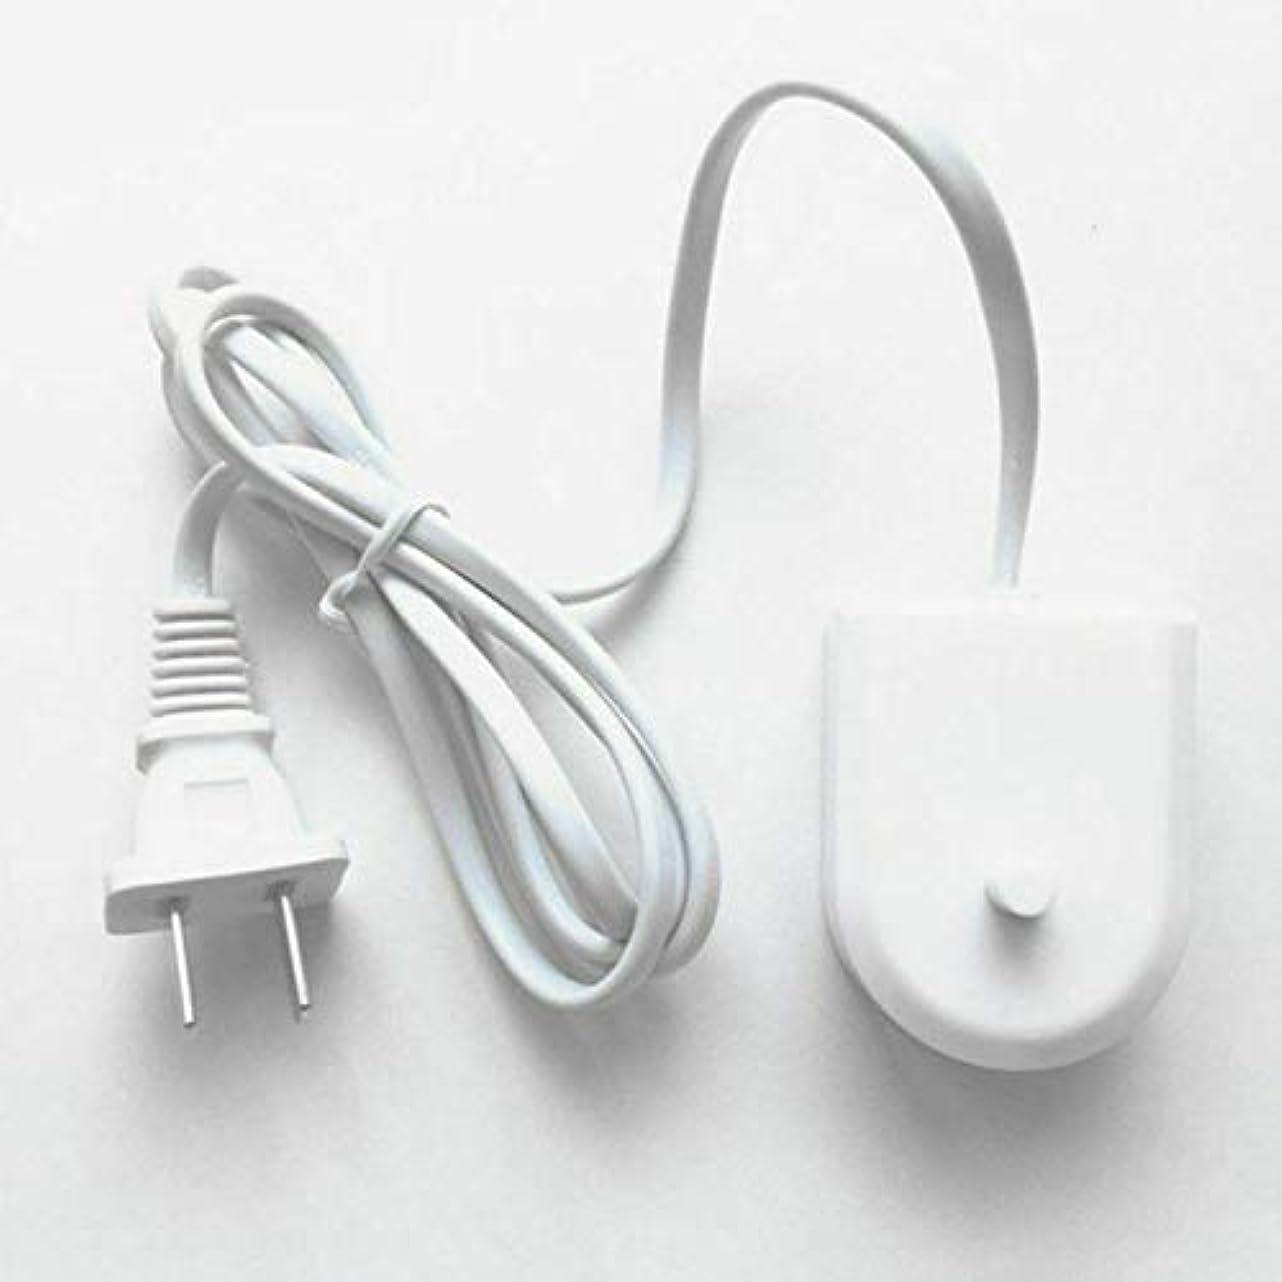 Philips sonicare 電動歯ブラシ専用 携帯用小型充電器 フィリップス ソニッケアー音波電動歯ブラシ 充電器 [並行輸入品]